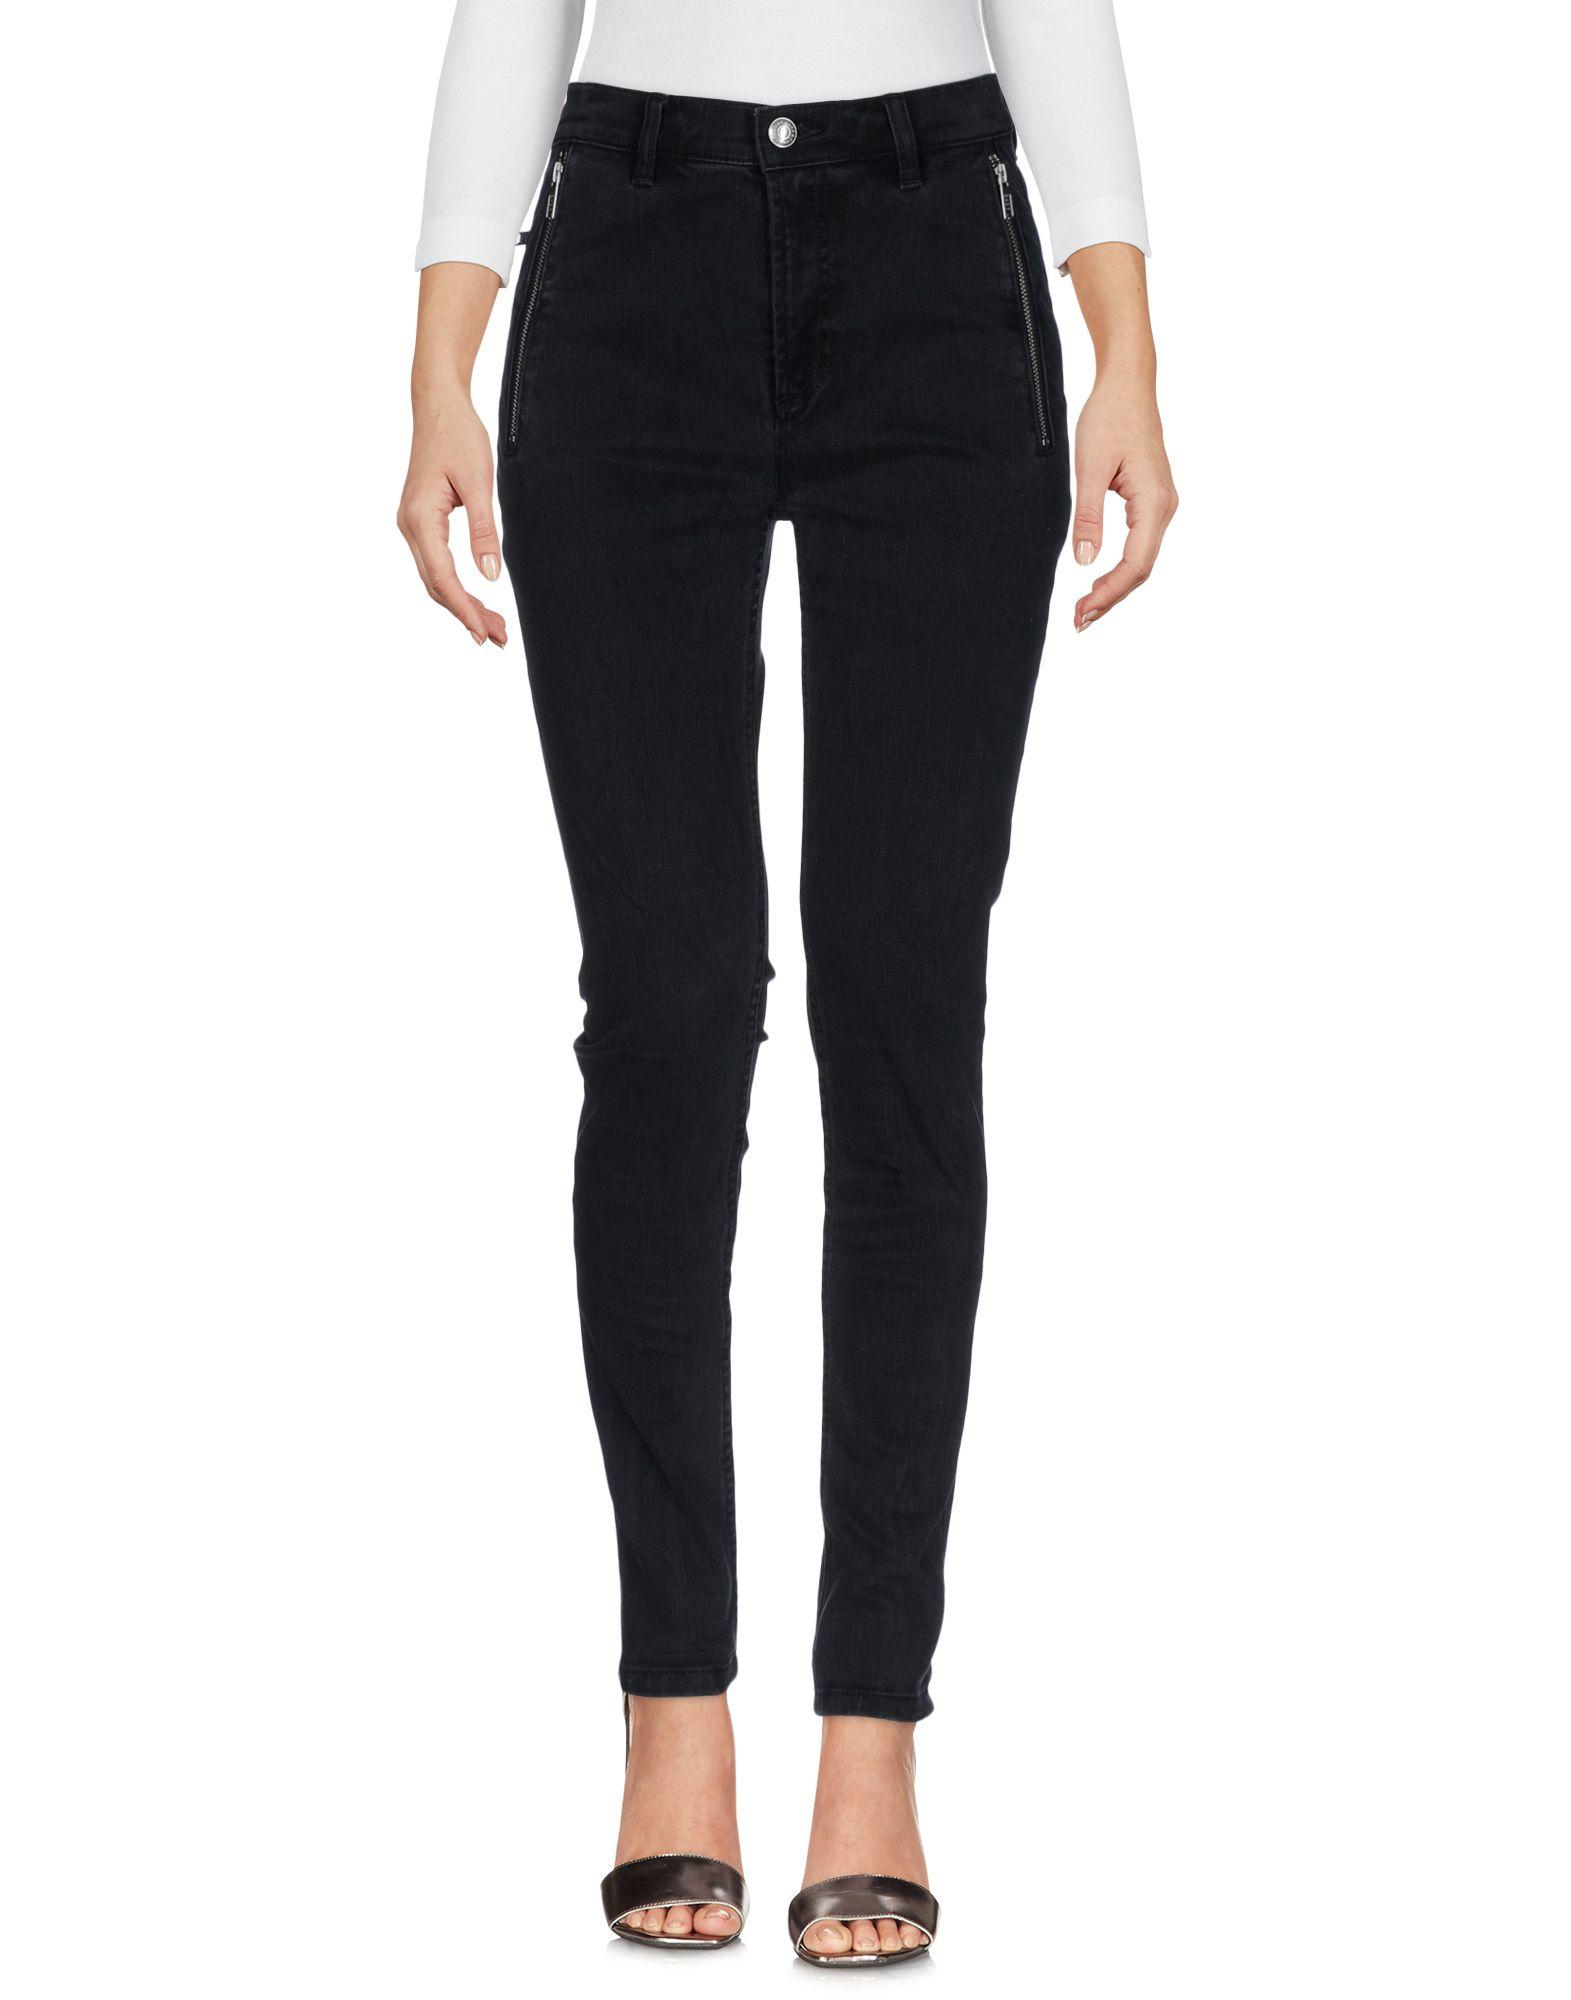 ФОТО marc by marc jacobs джинсовые брюки